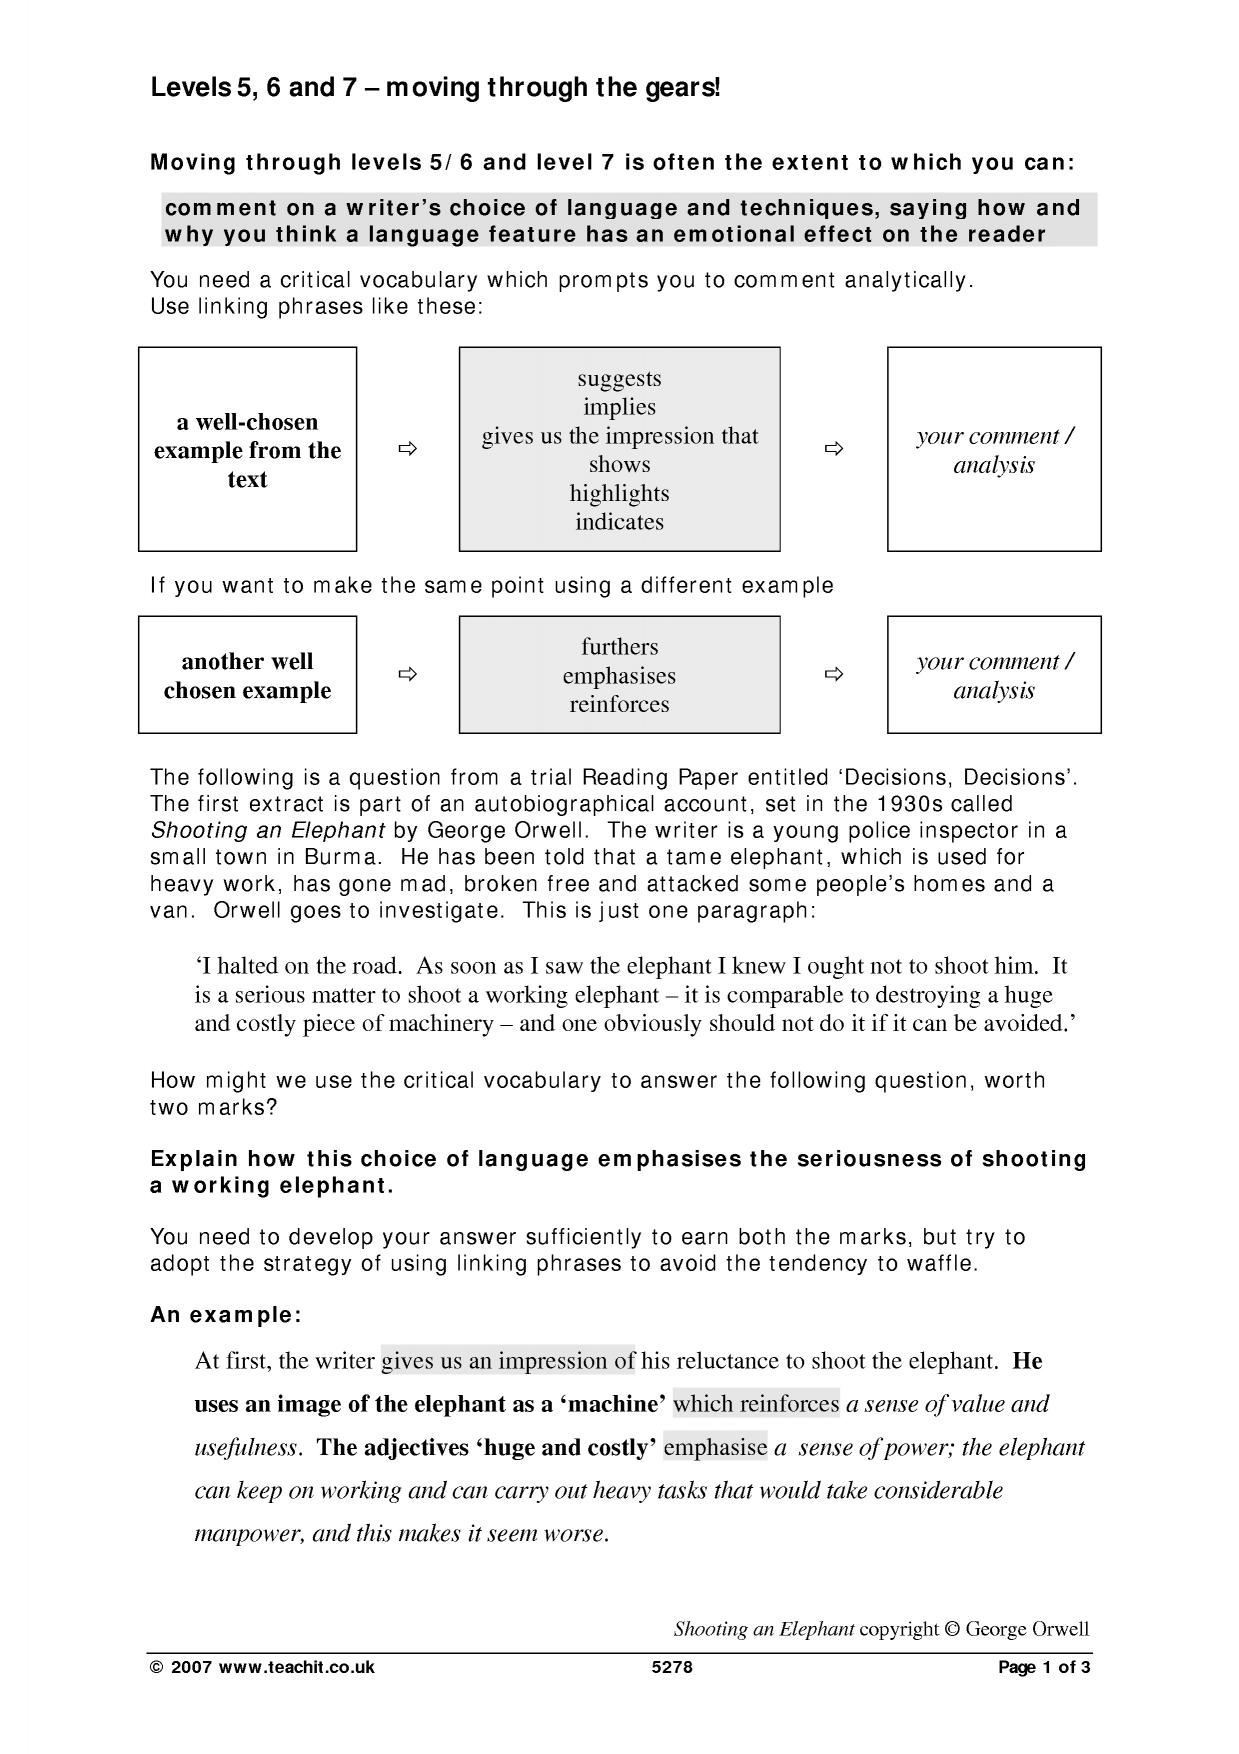 pee language analysis vce guide